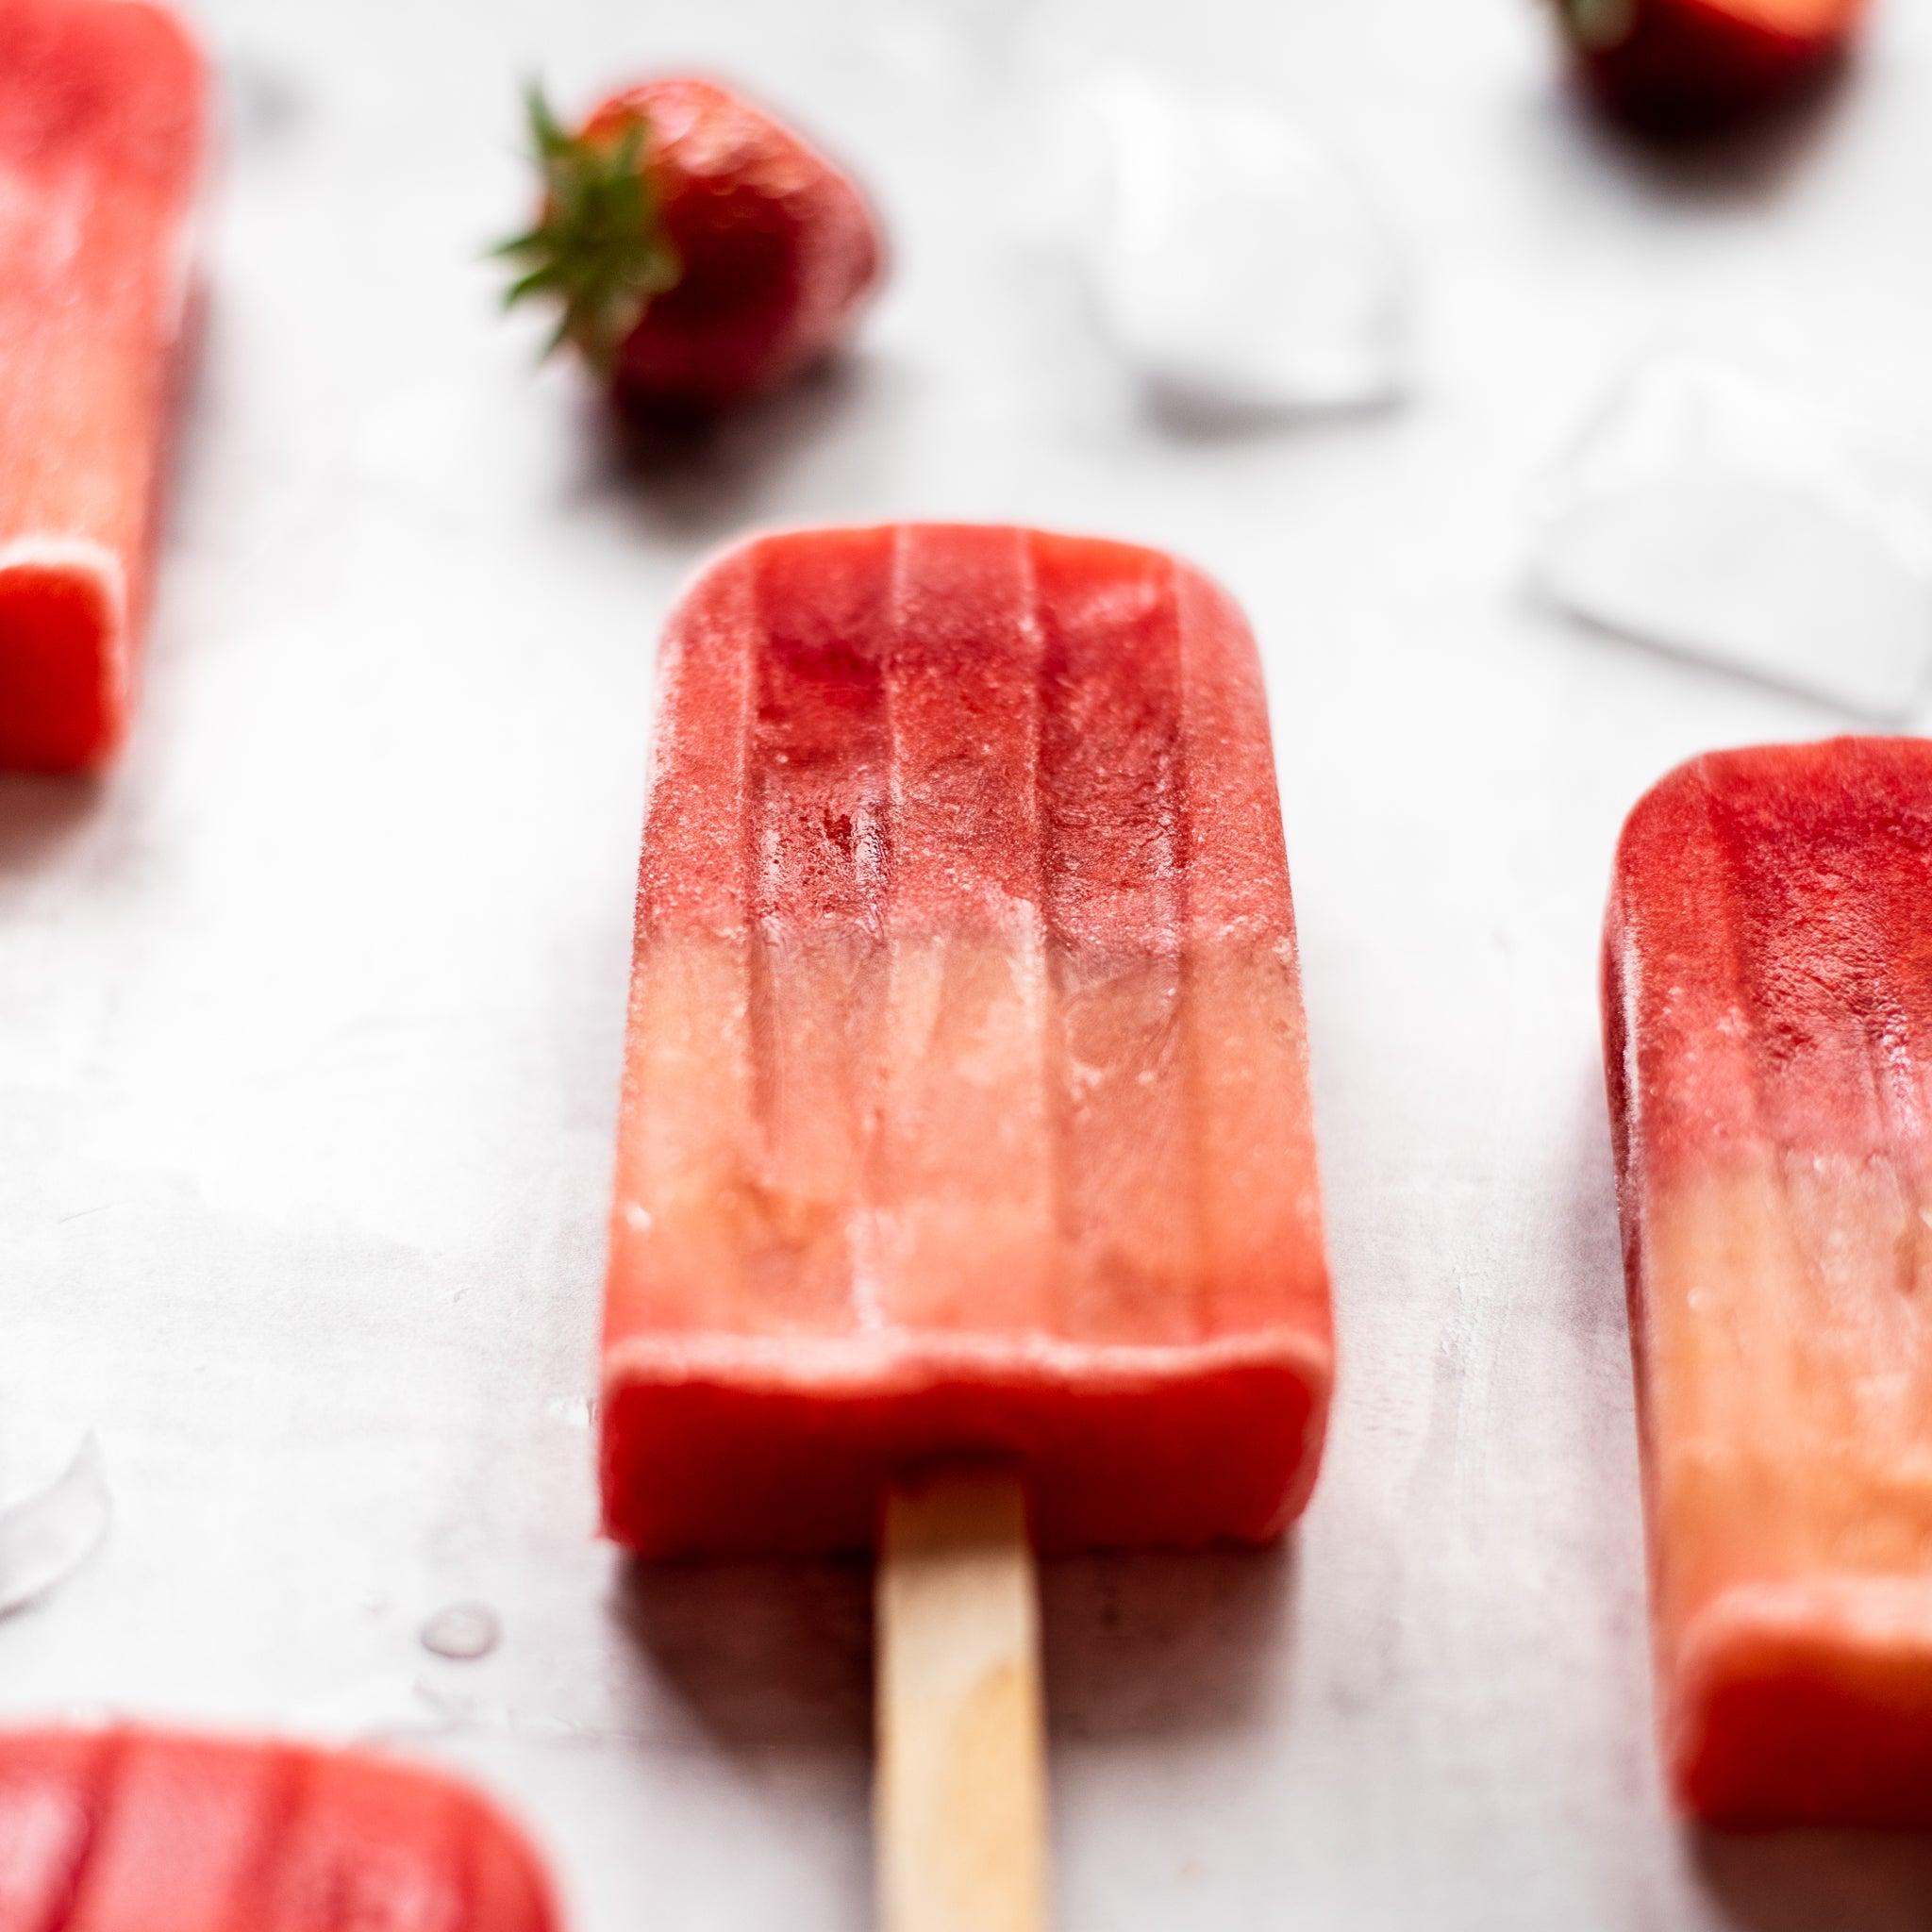 Strawberry-And-Orange-Lollies-SQUARE-7.jpg